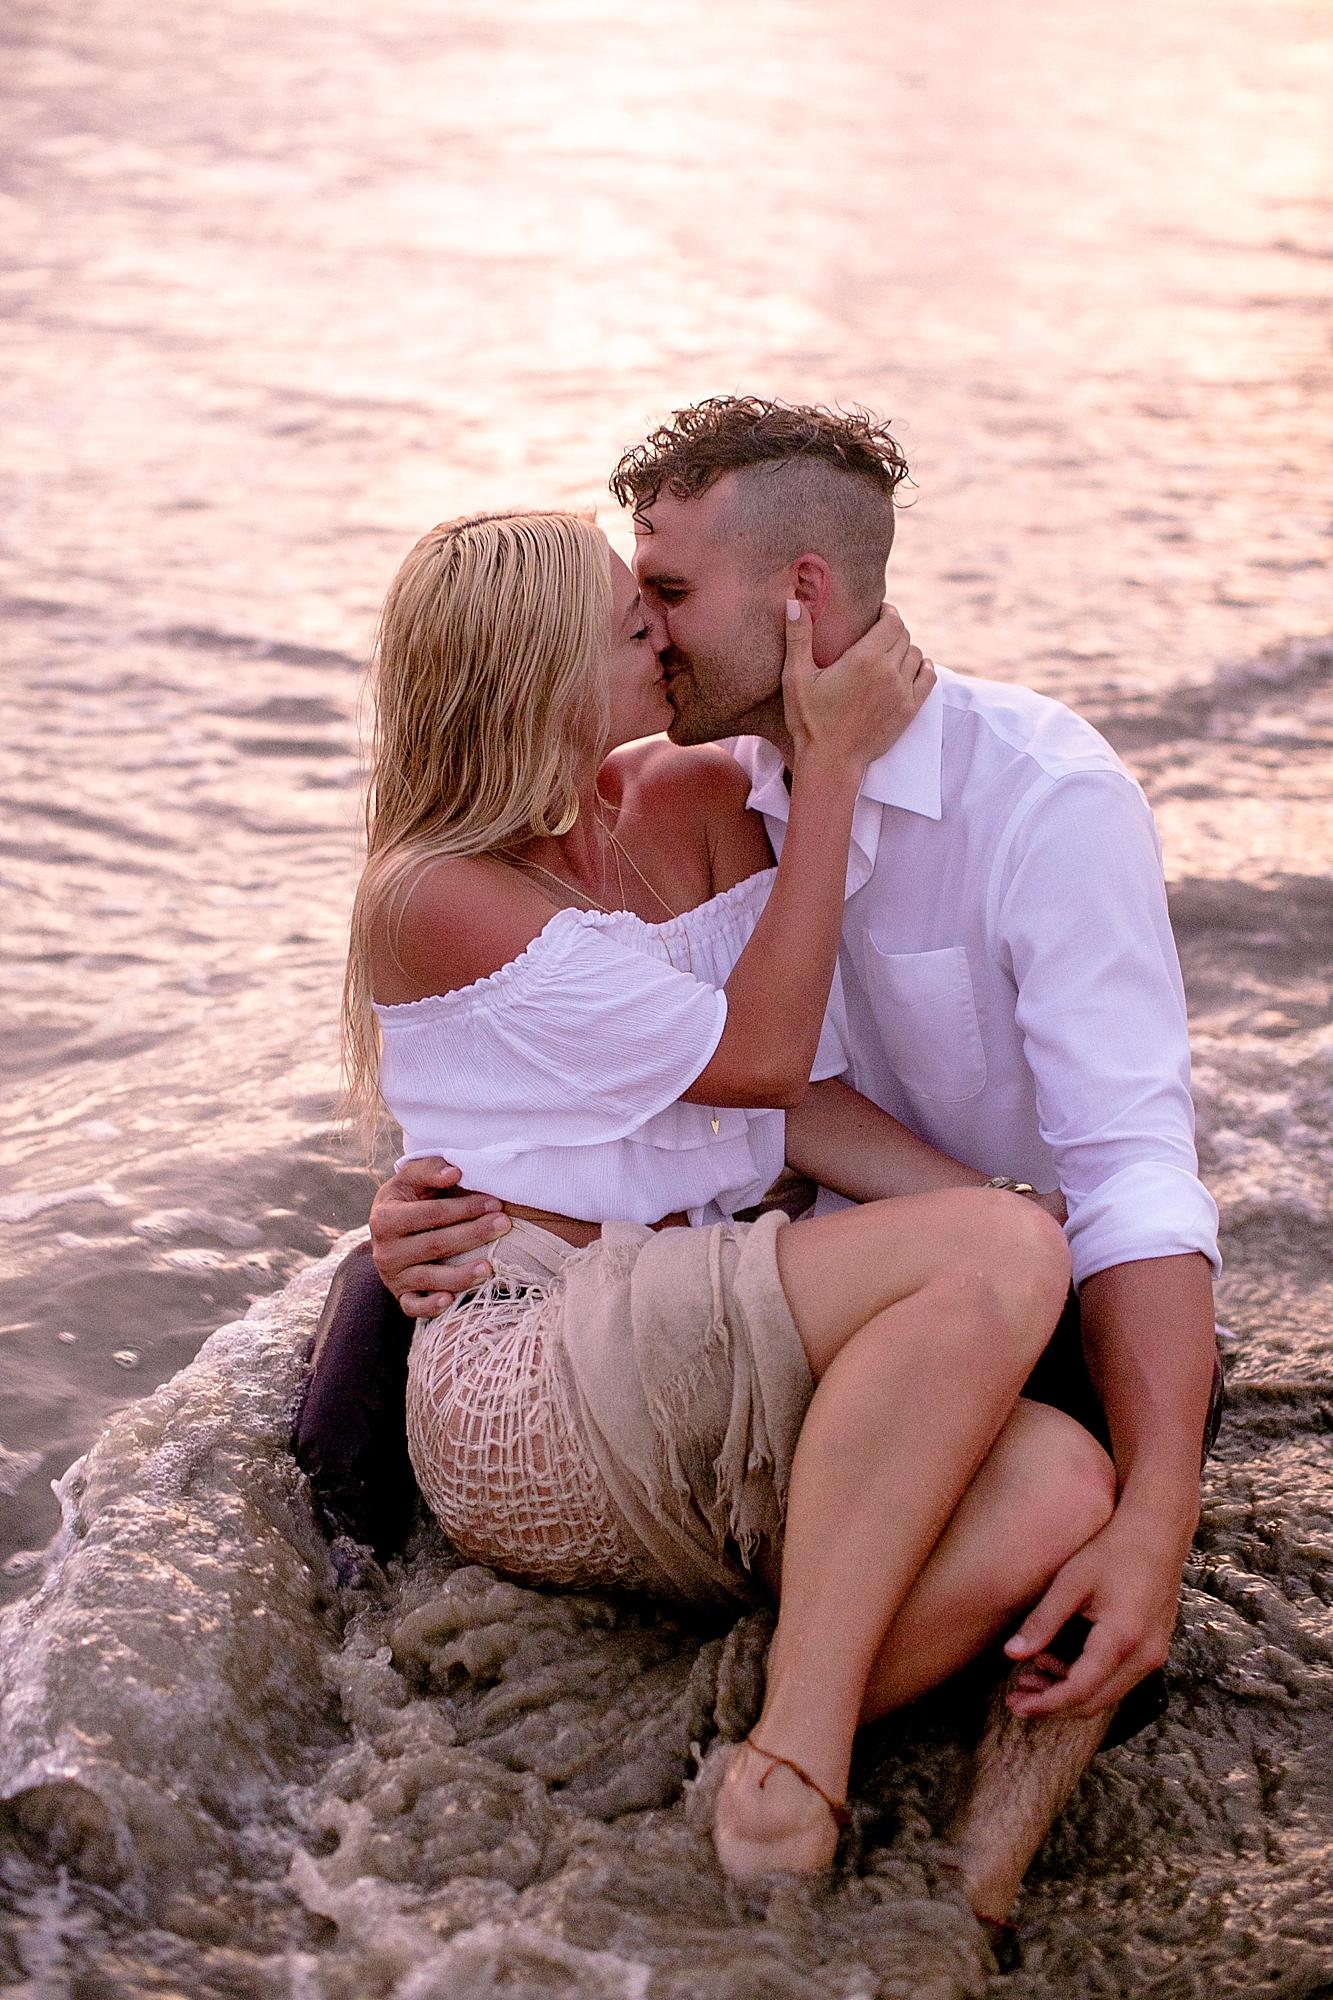 Epic and Adventurous Travel Wedding and Portrait Photographer in Nosara, Costa Rica - Kelee Bovelle @xokelee @keleeb - 25.jpg